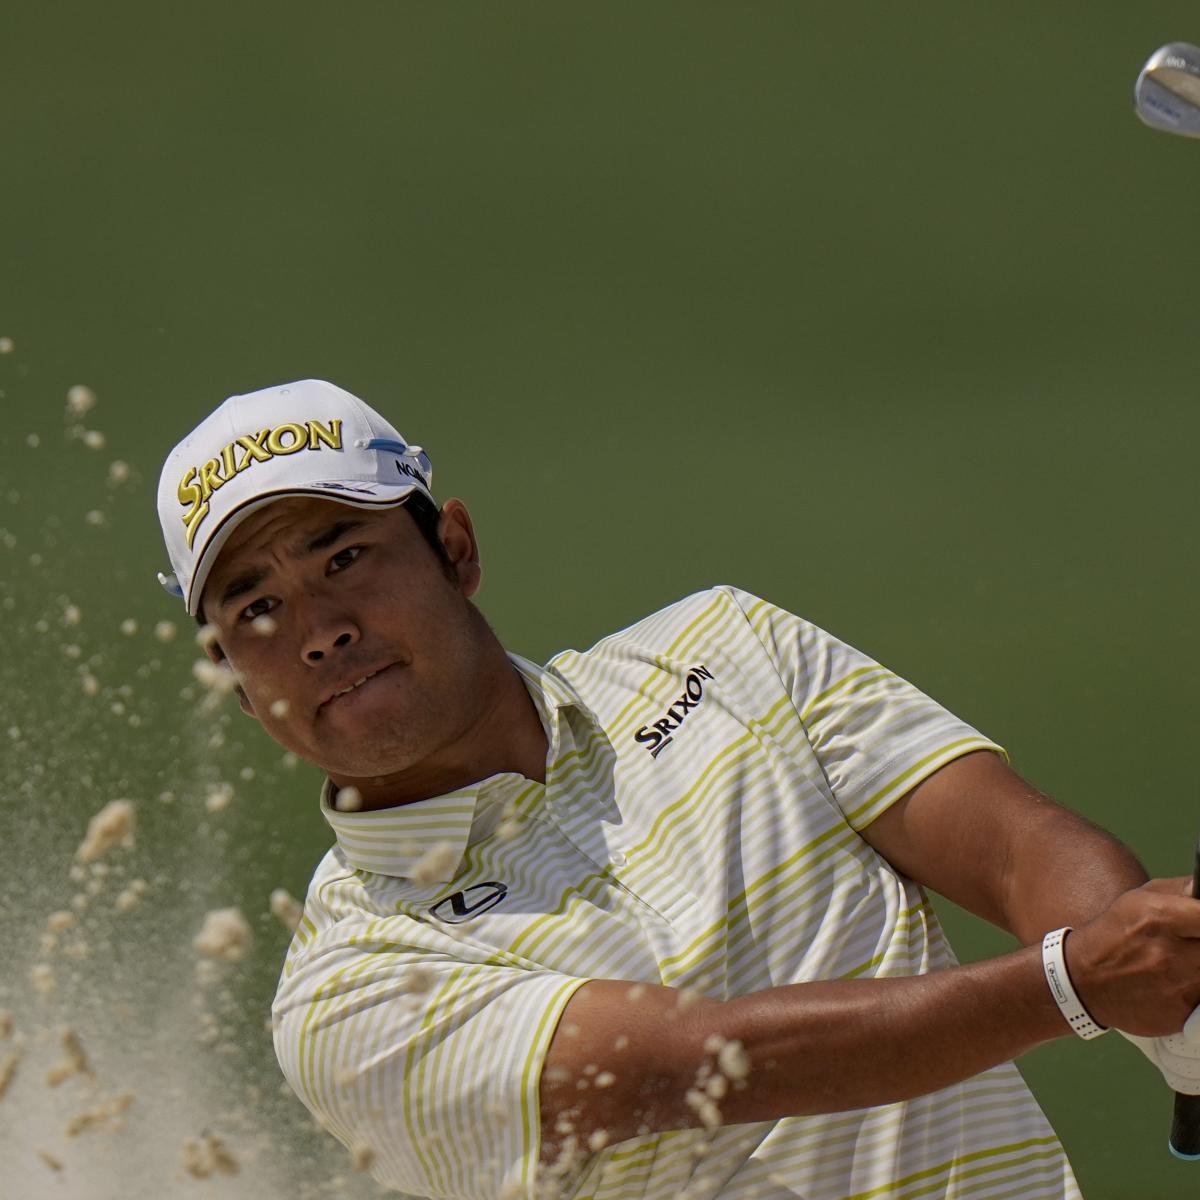 Hideki Matsuyama Wins 2021 Masters, Becomes 1st Japanese Men's Major Champion